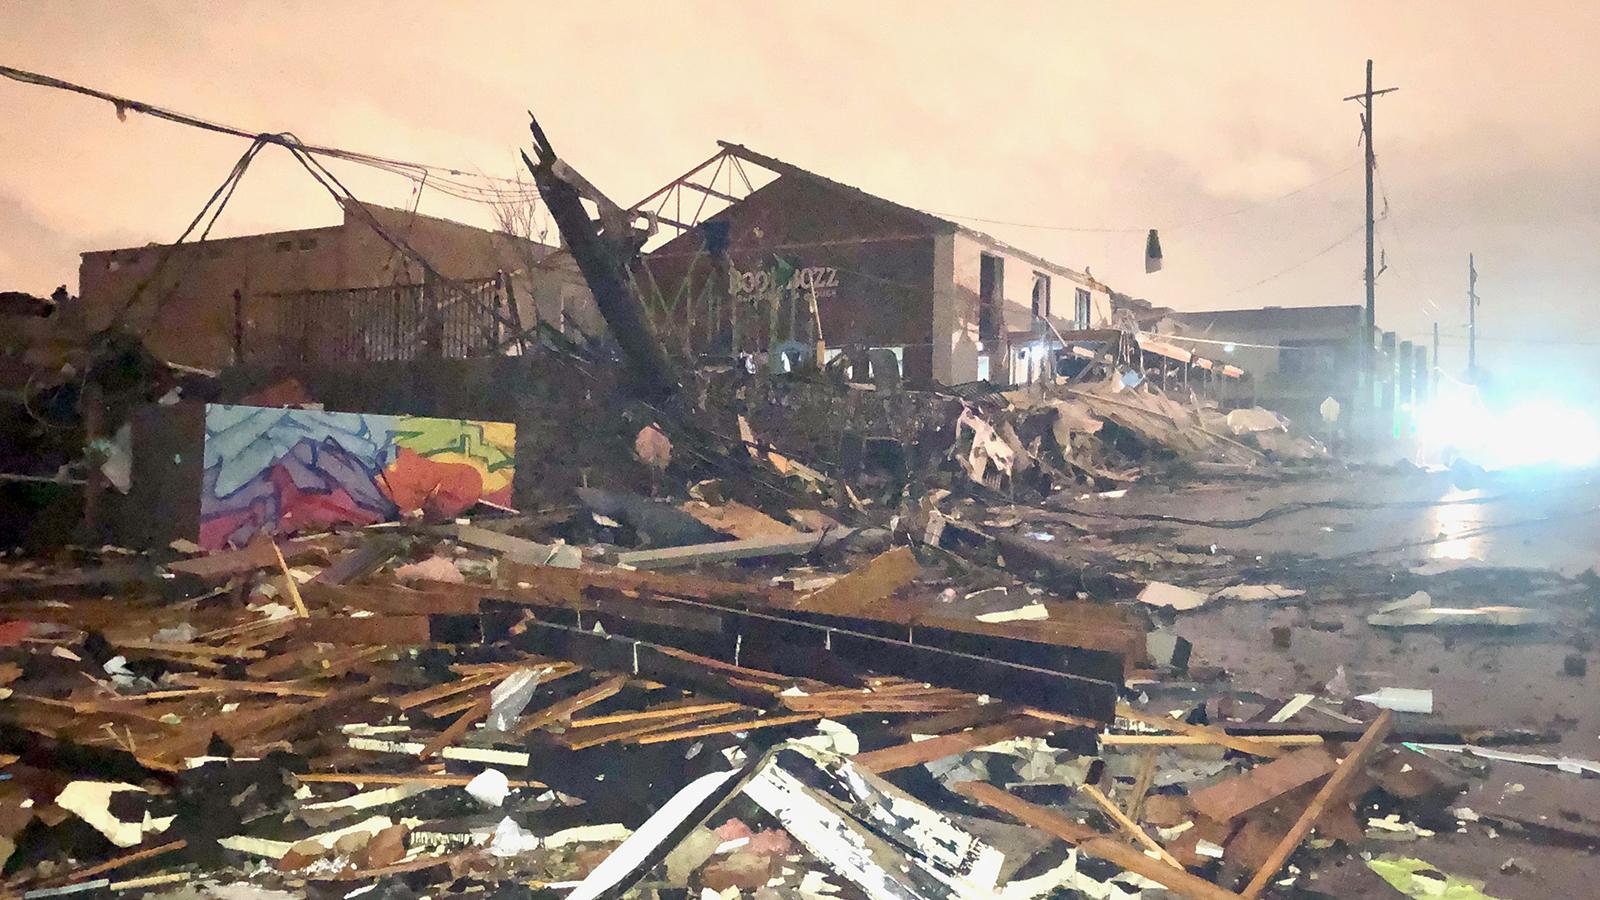 Aftermath of the devastating tornadoes in Nashville, TN.